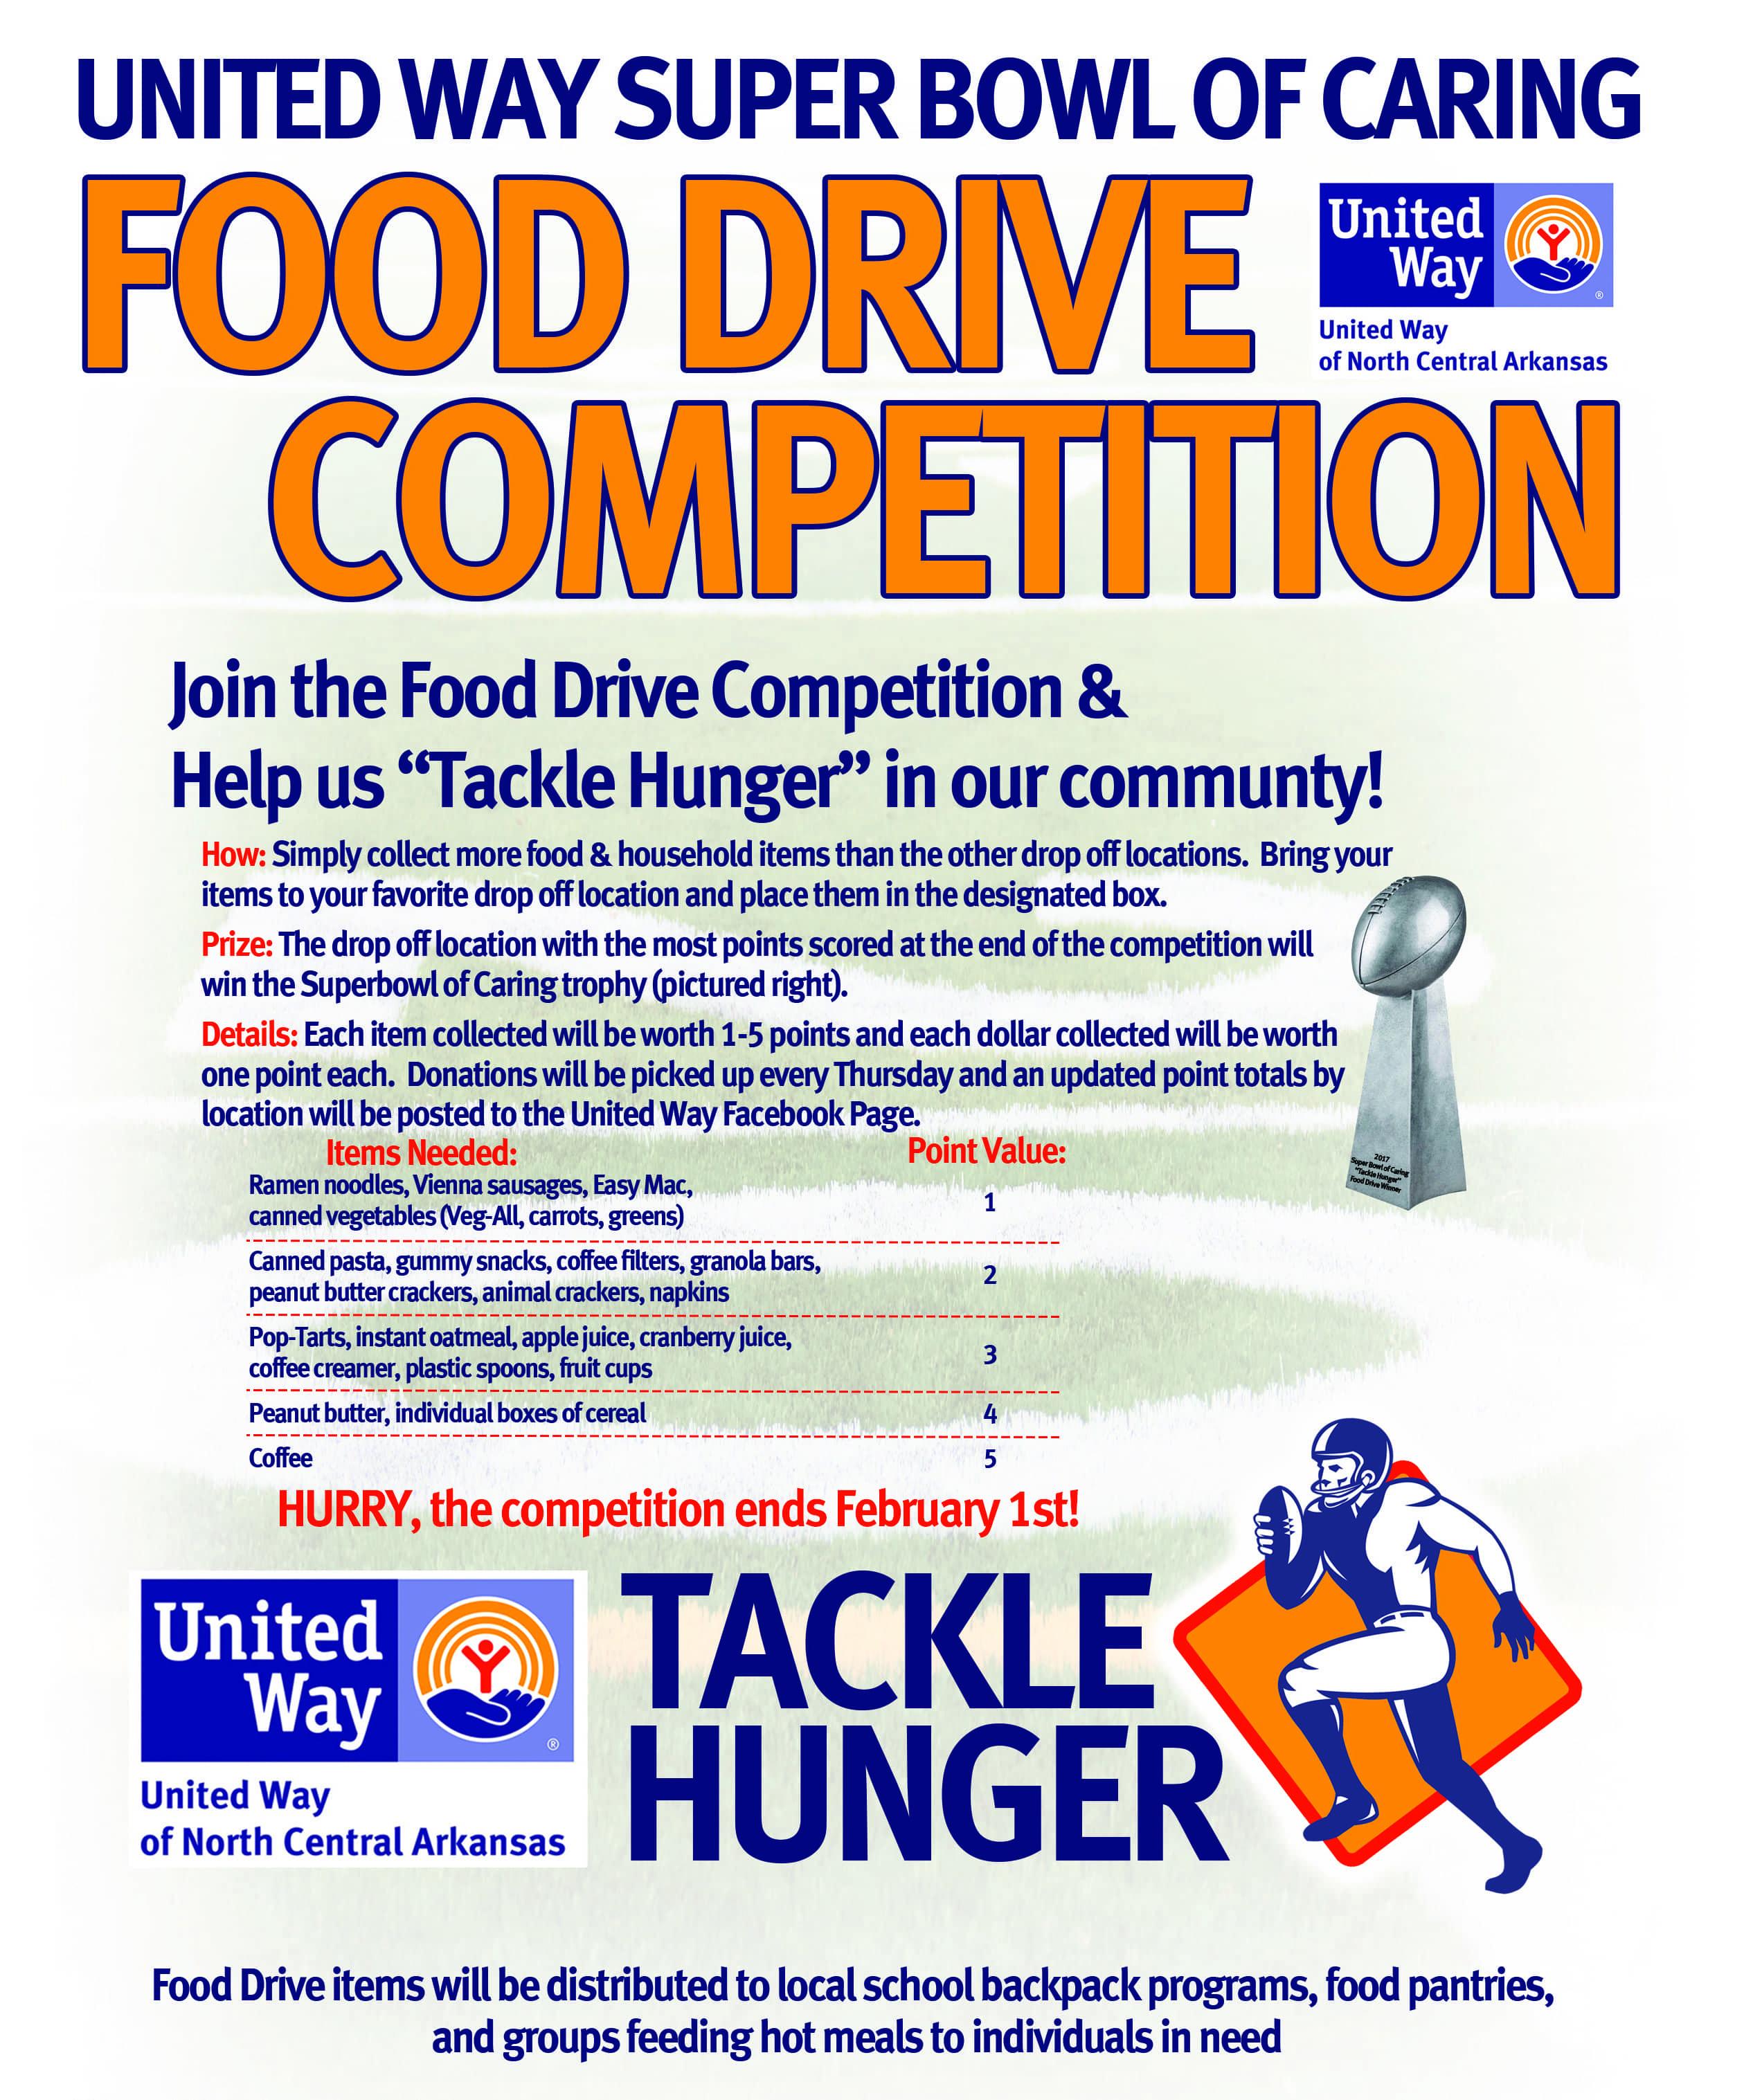 UW_Tackle_Hunger_Flyer_JPEG 19.jpg